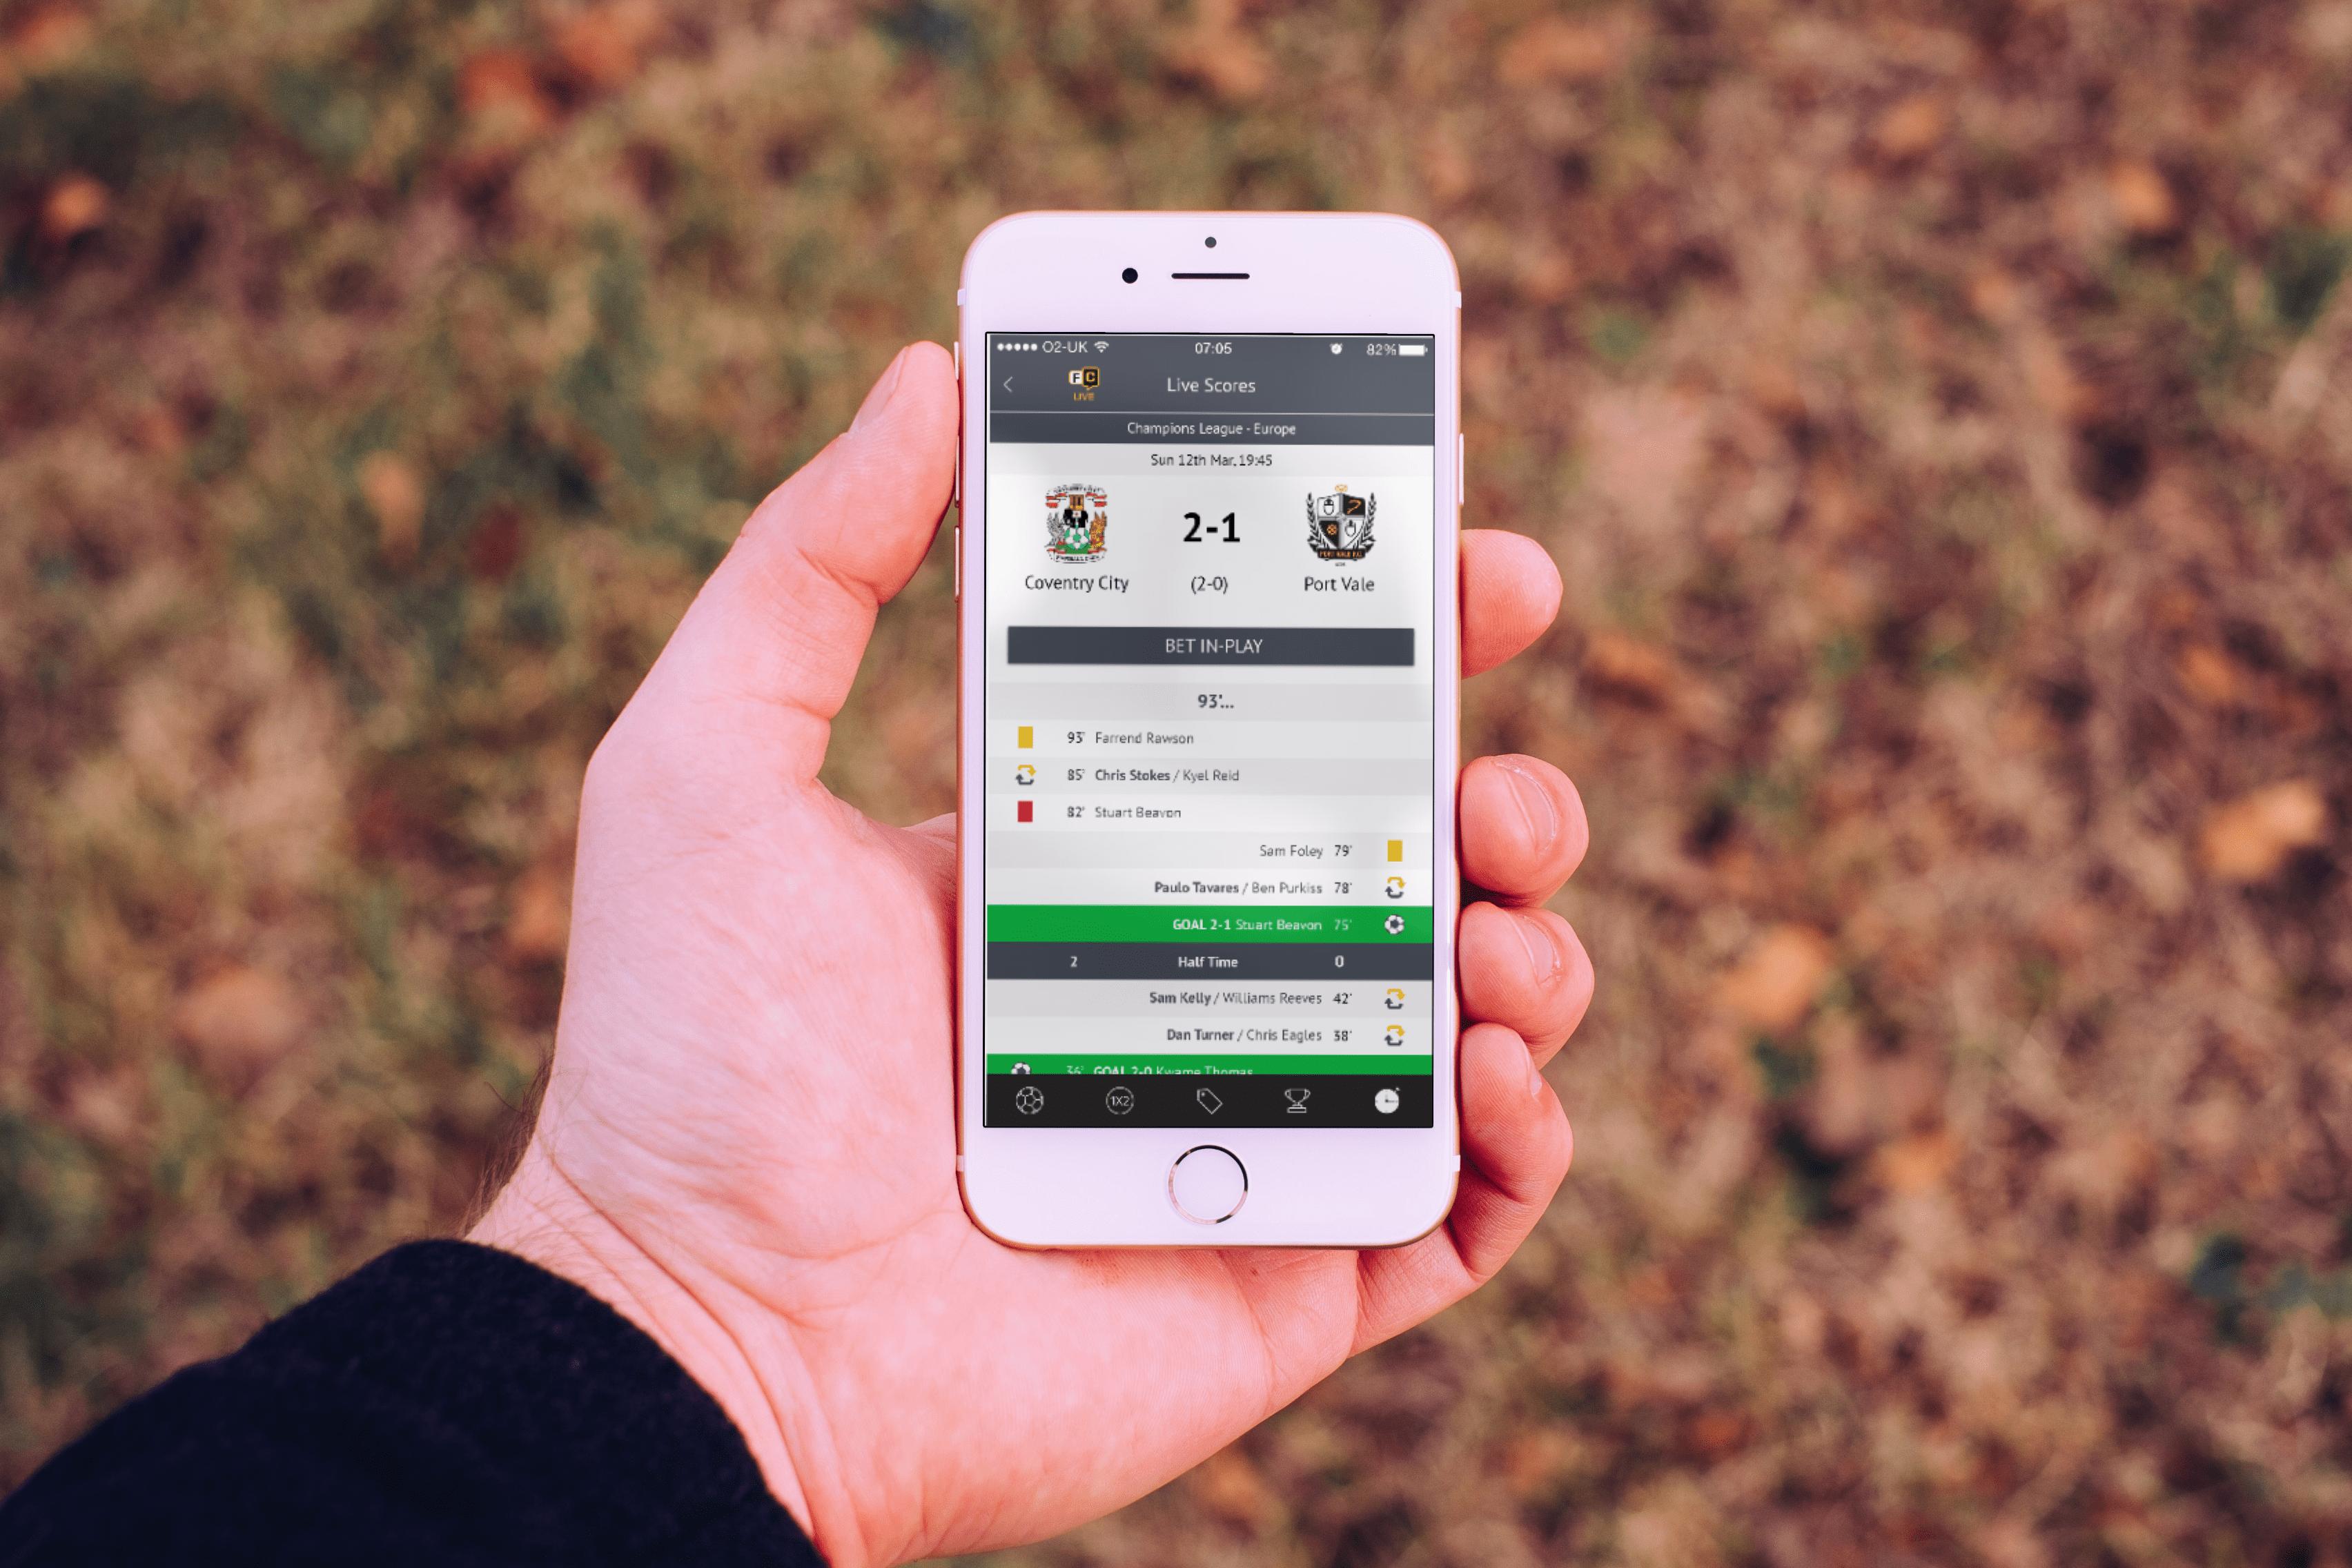 Football Coupon With The Telegraph Hybrid App Sonin App Development